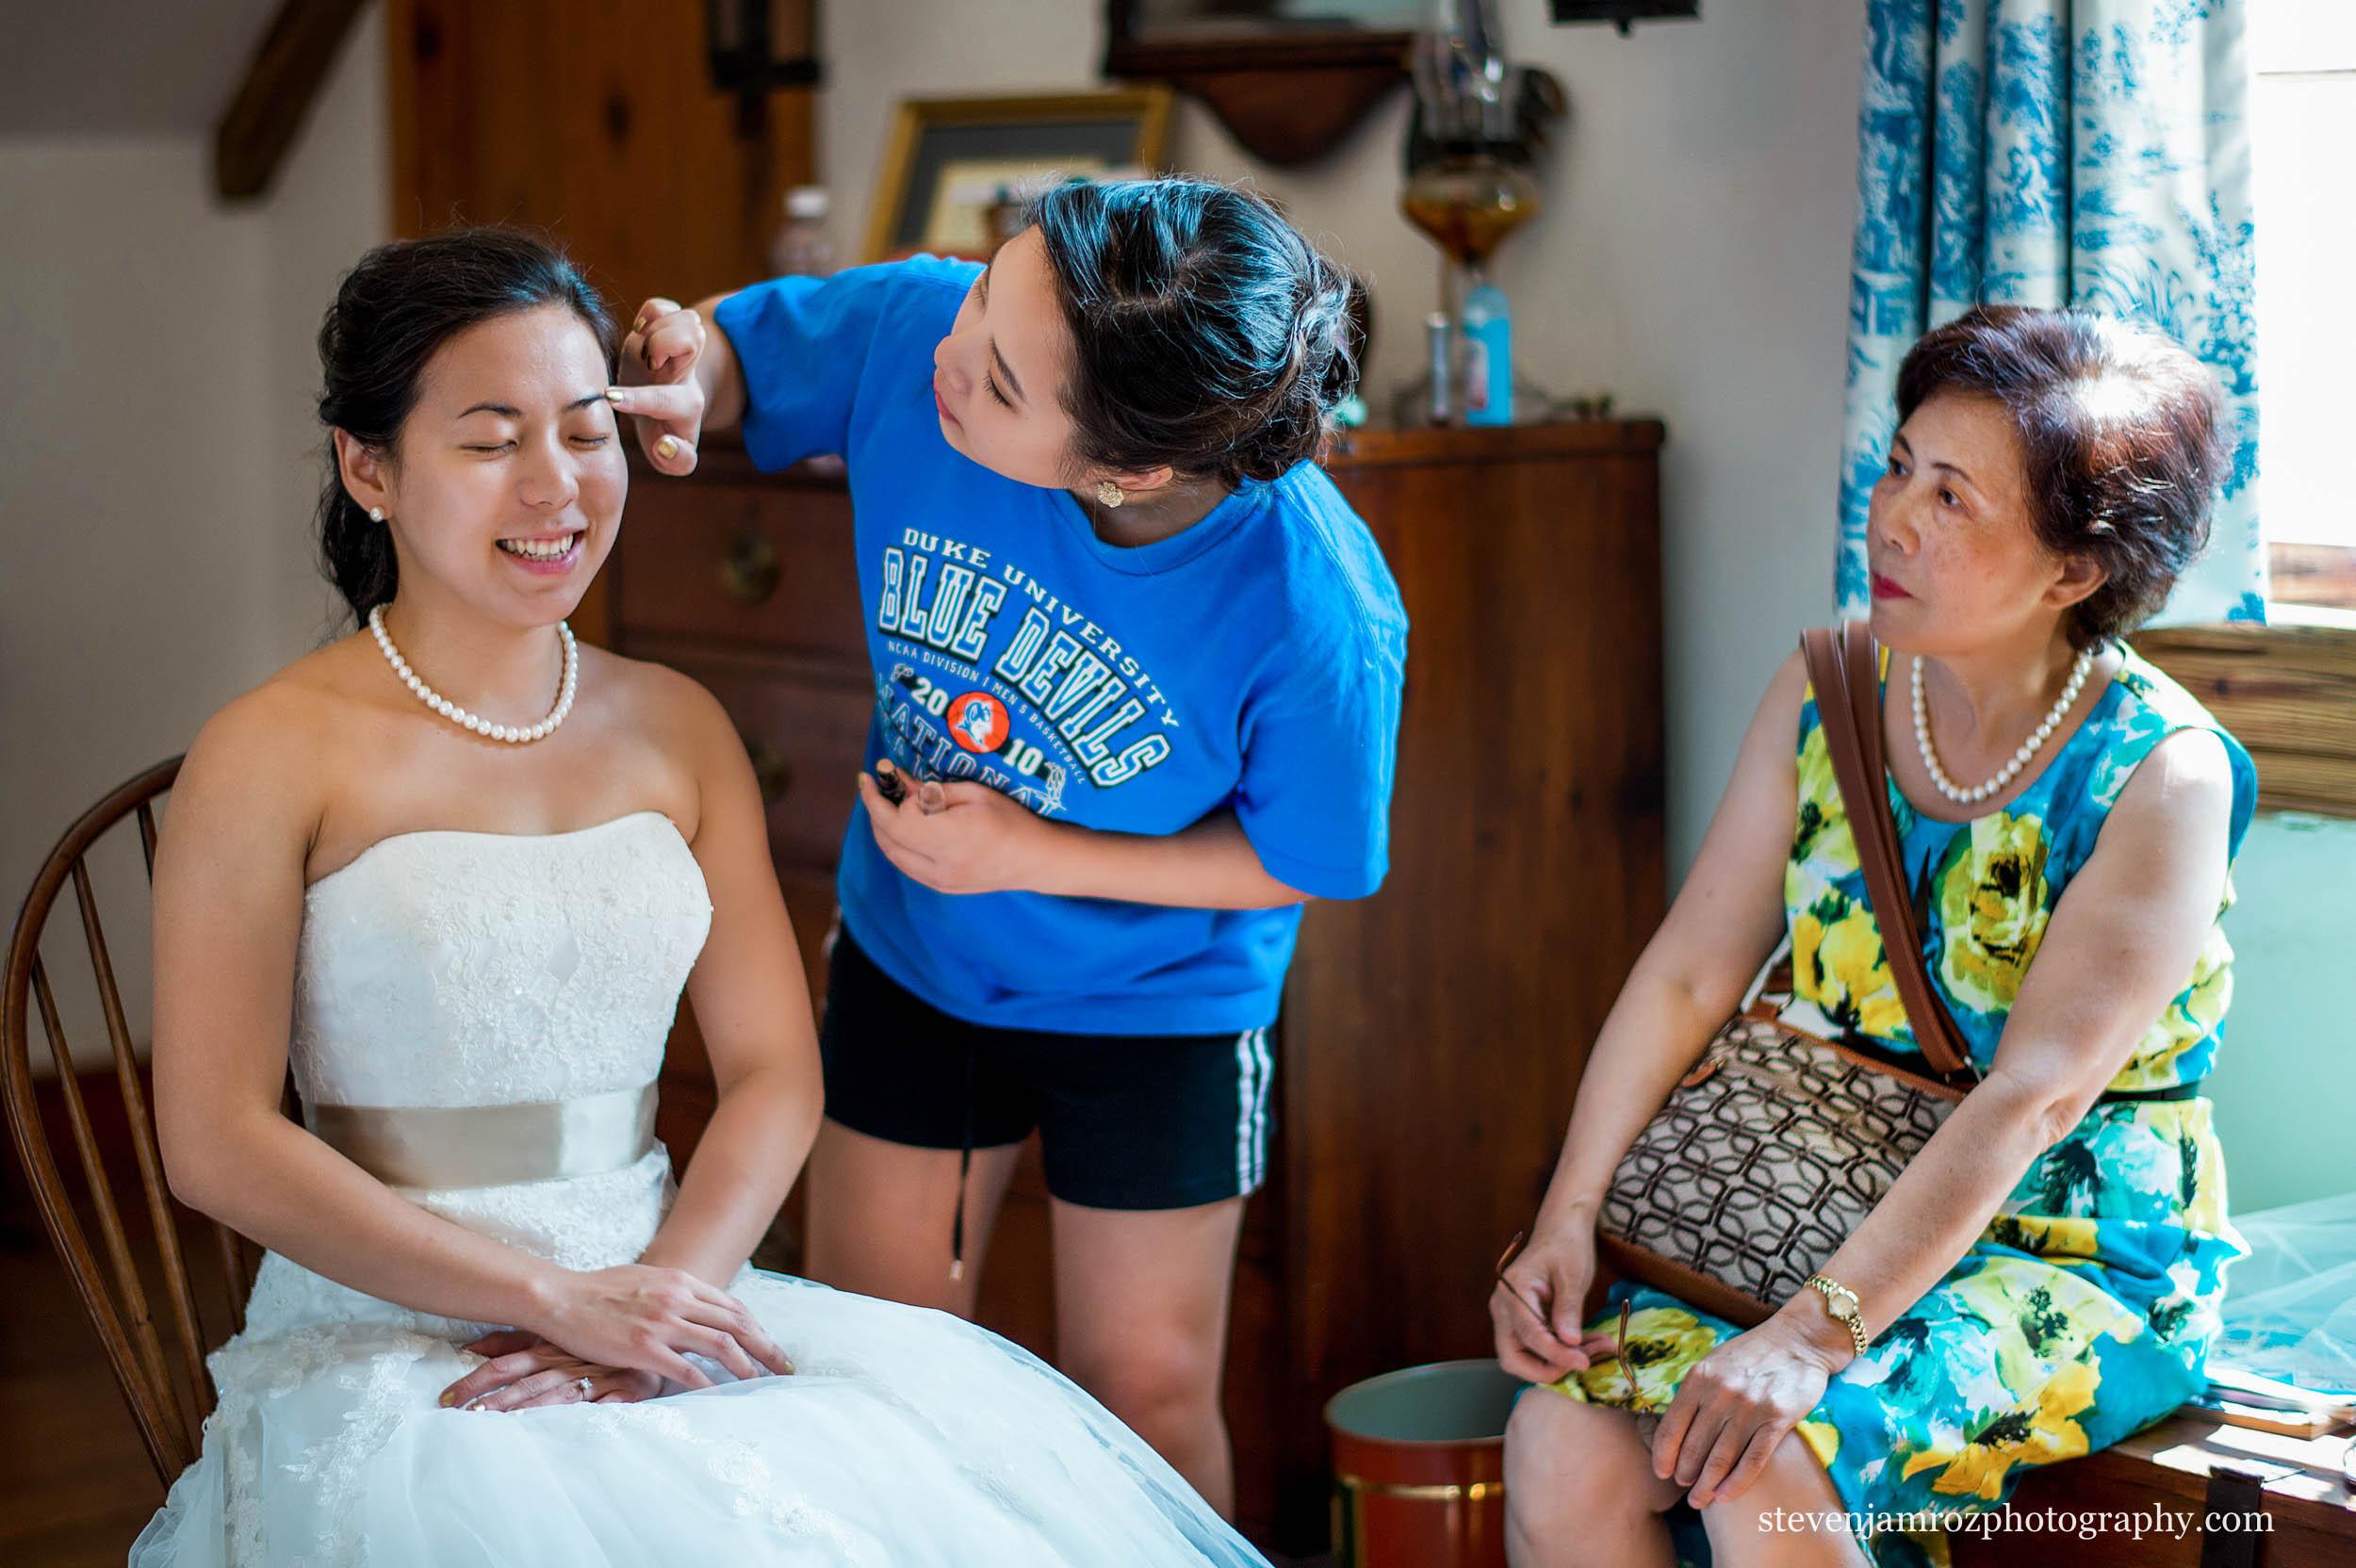 makeup-wedding-raleigh-steven-jamroz-photography-0338.jpg